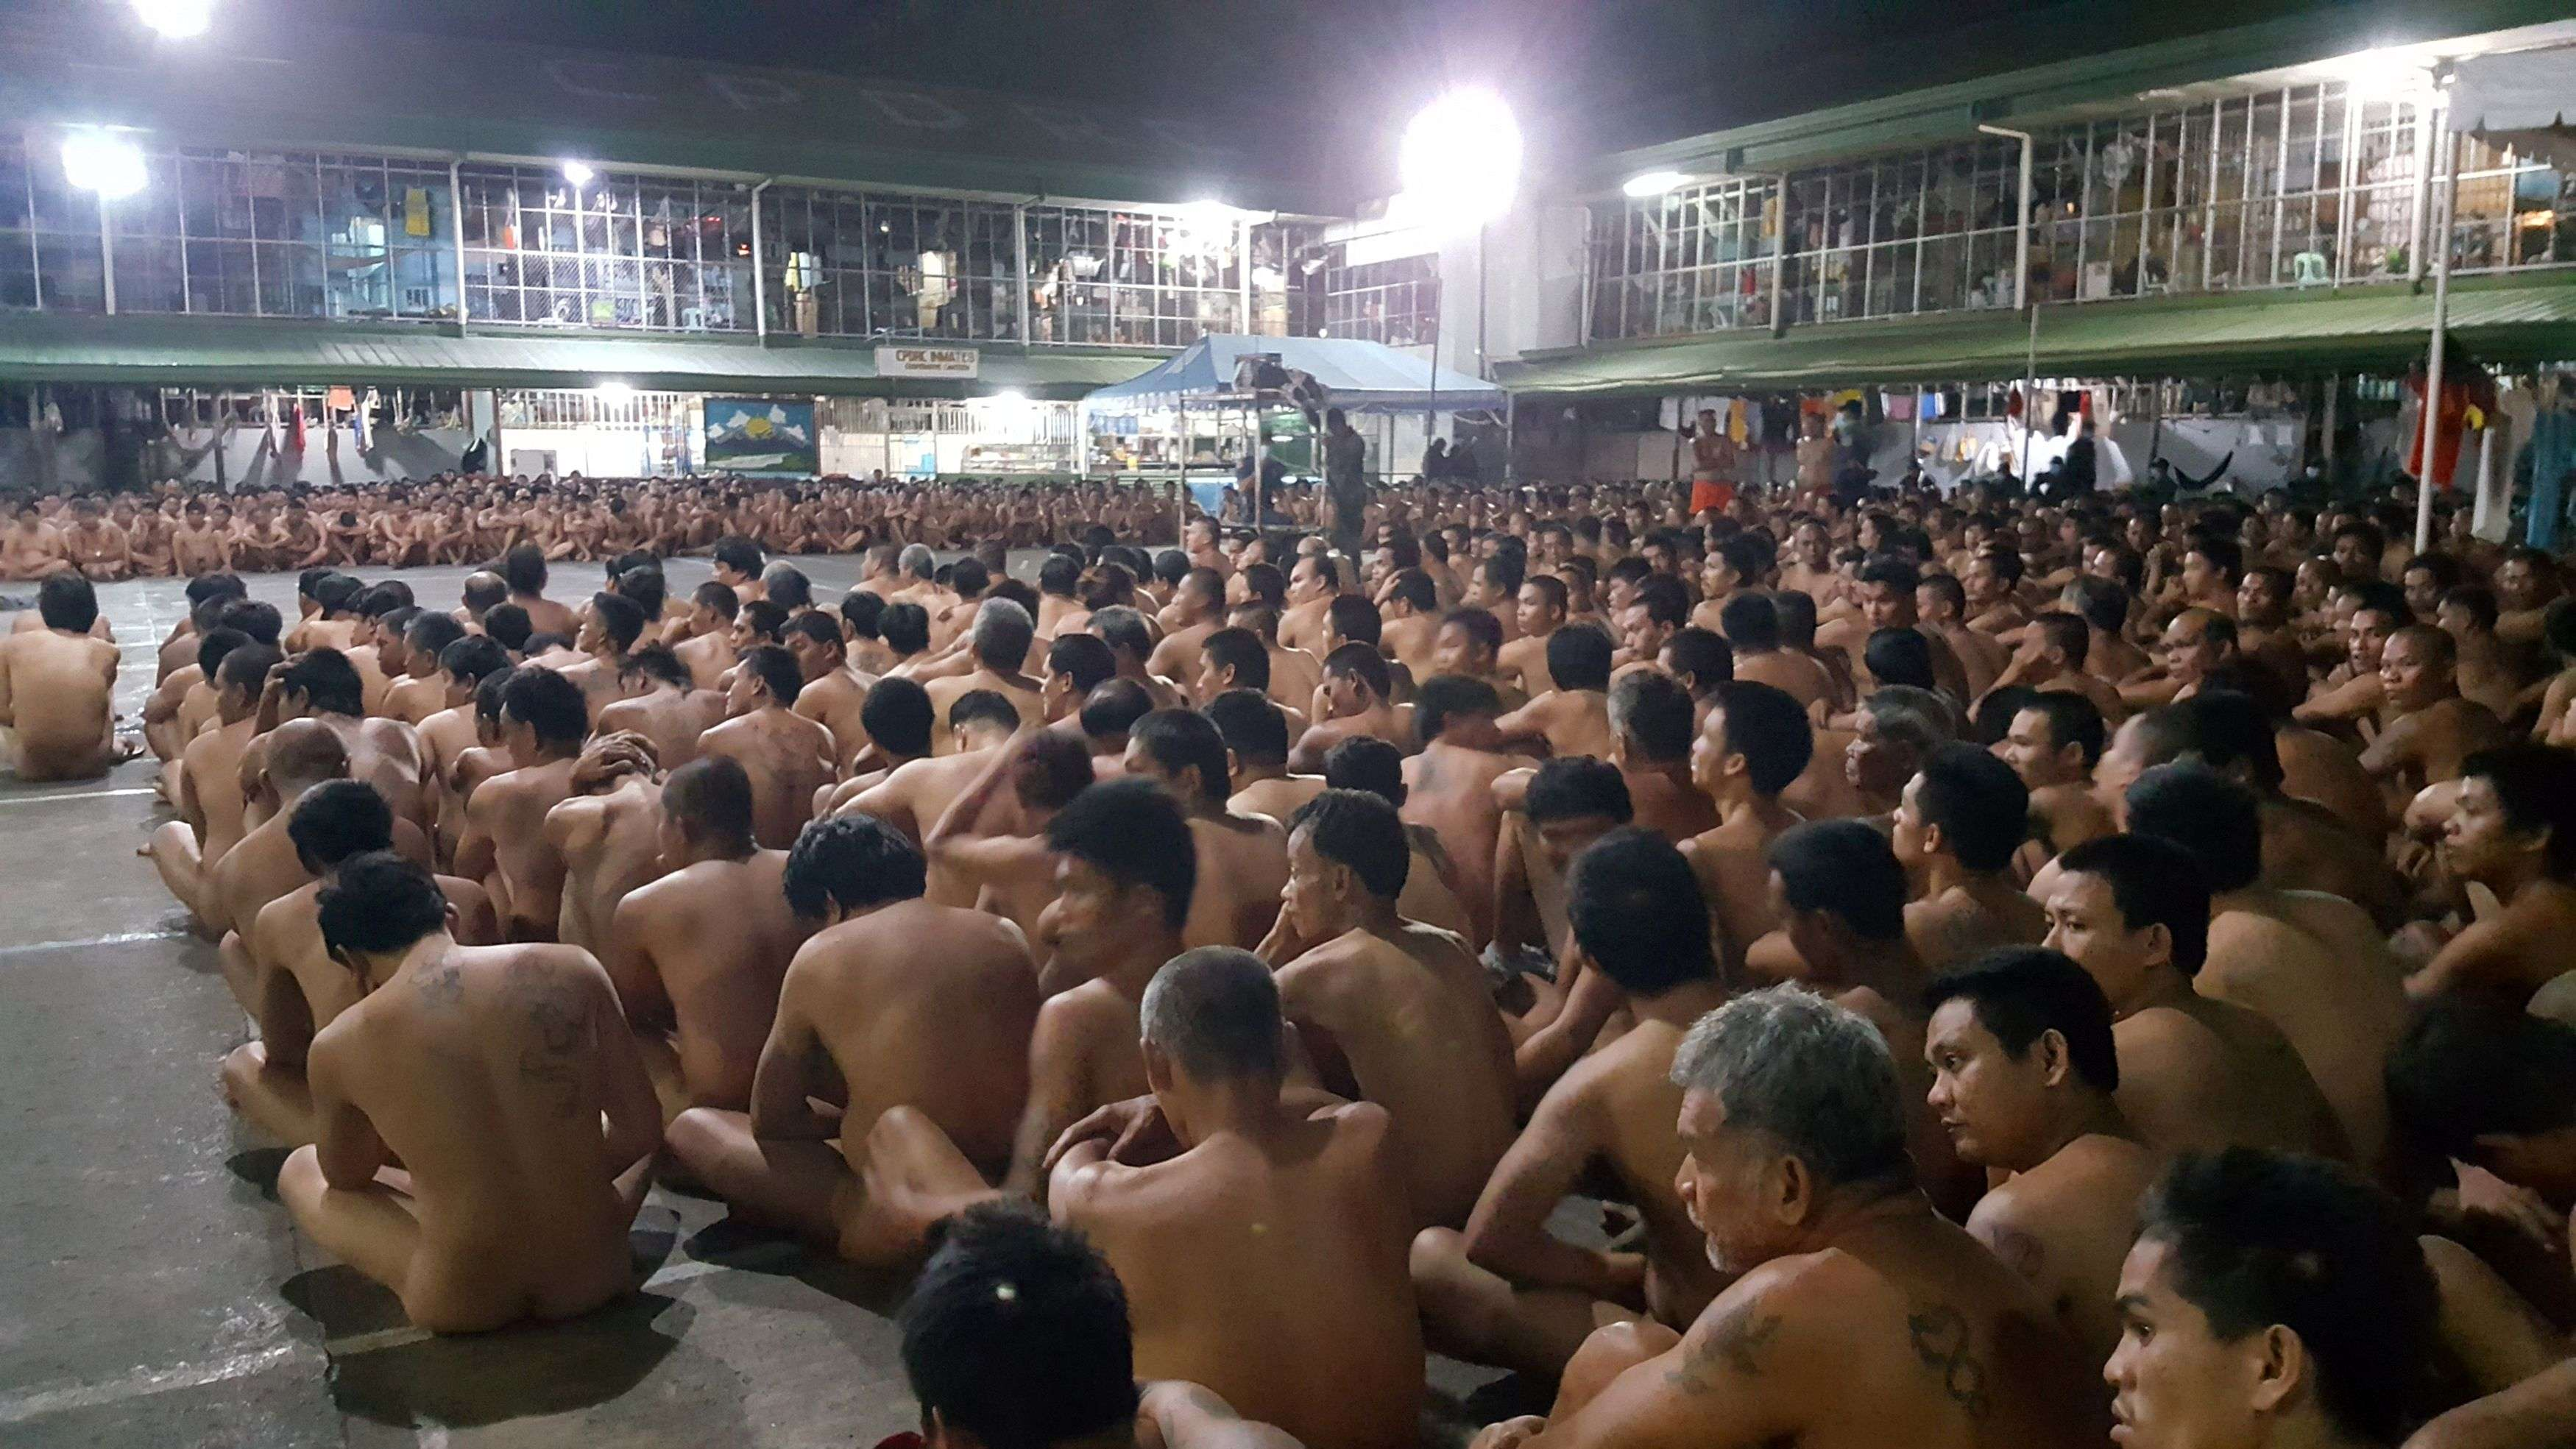 Cruel Inhumane And Degrading Mass Strip Search At Philippine